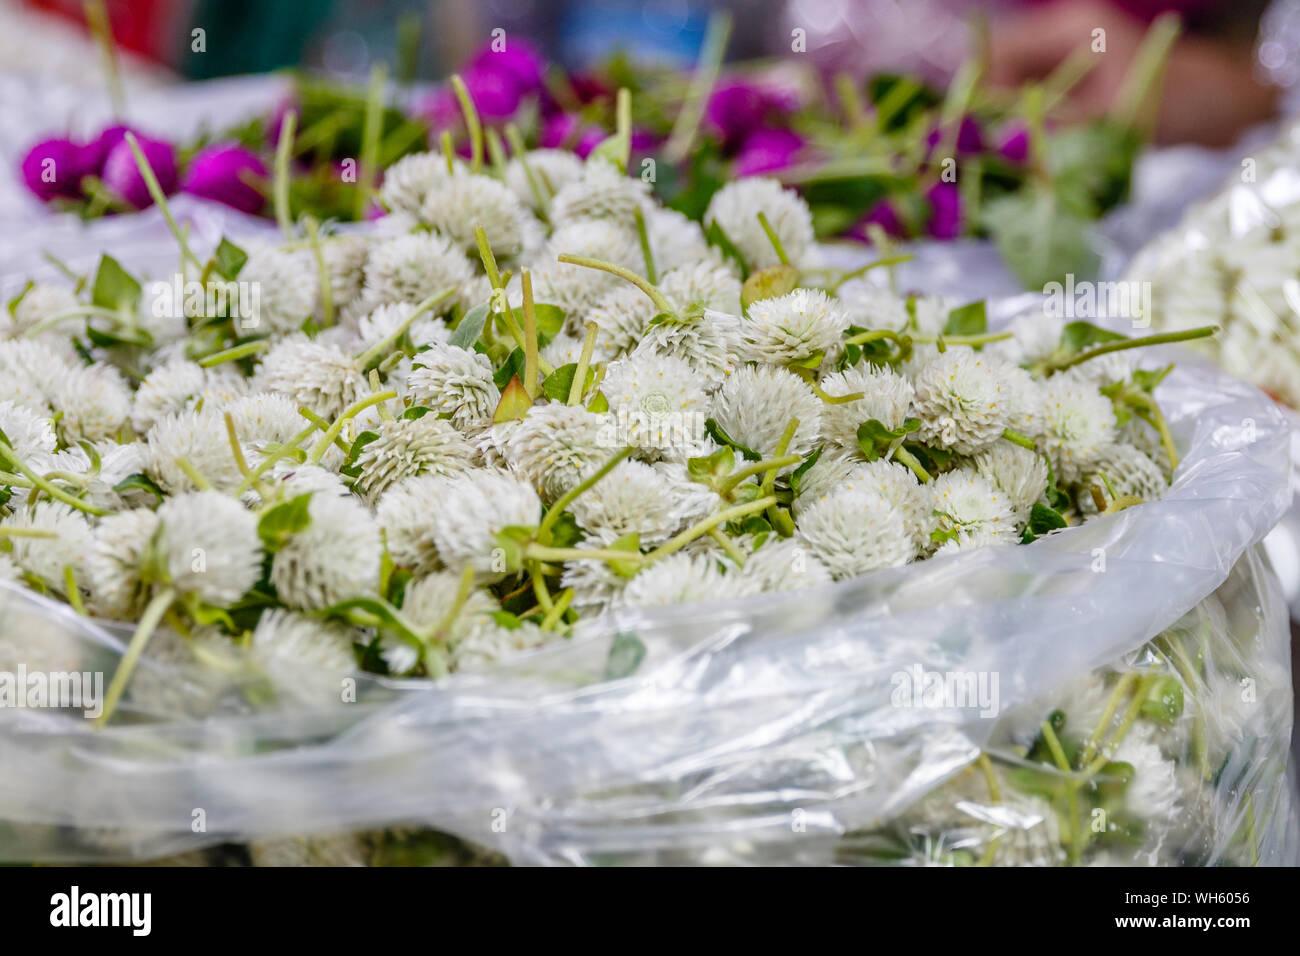 Bags of white сlover or trefoil for making traditional flower garland offerings phuang malai at Pak Khlong Talat, Bangkok flower market. Thailand Stock Photo